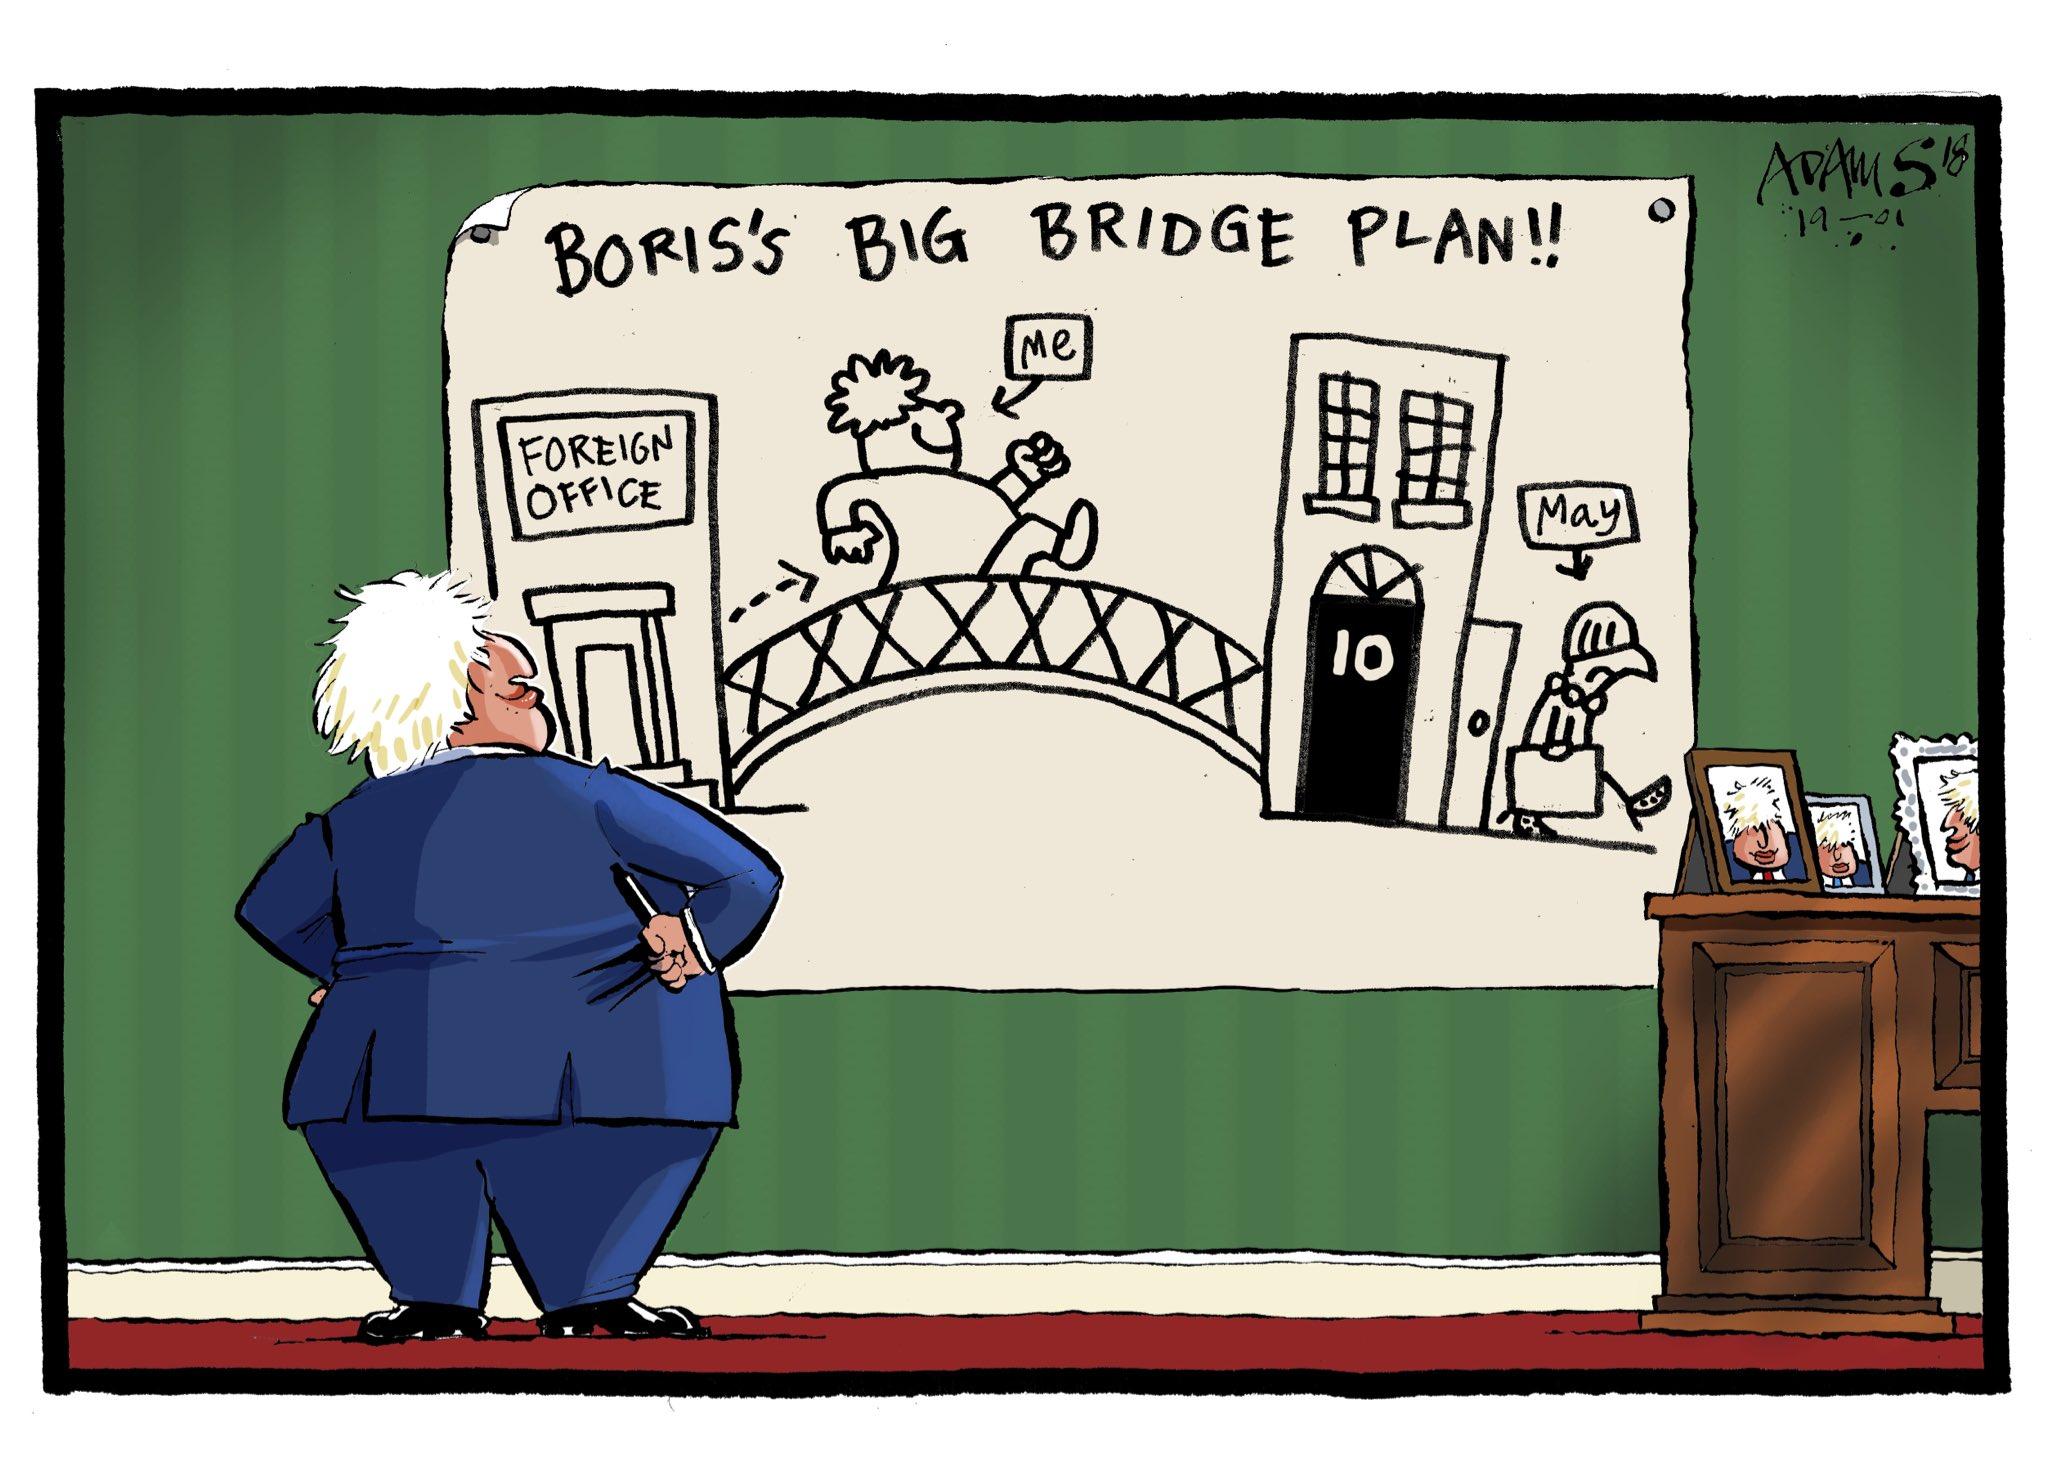 Our @adamstoon1 @eveningstandard on Boris's plan for a new bridge https://t.co/R7K3GM6H7D